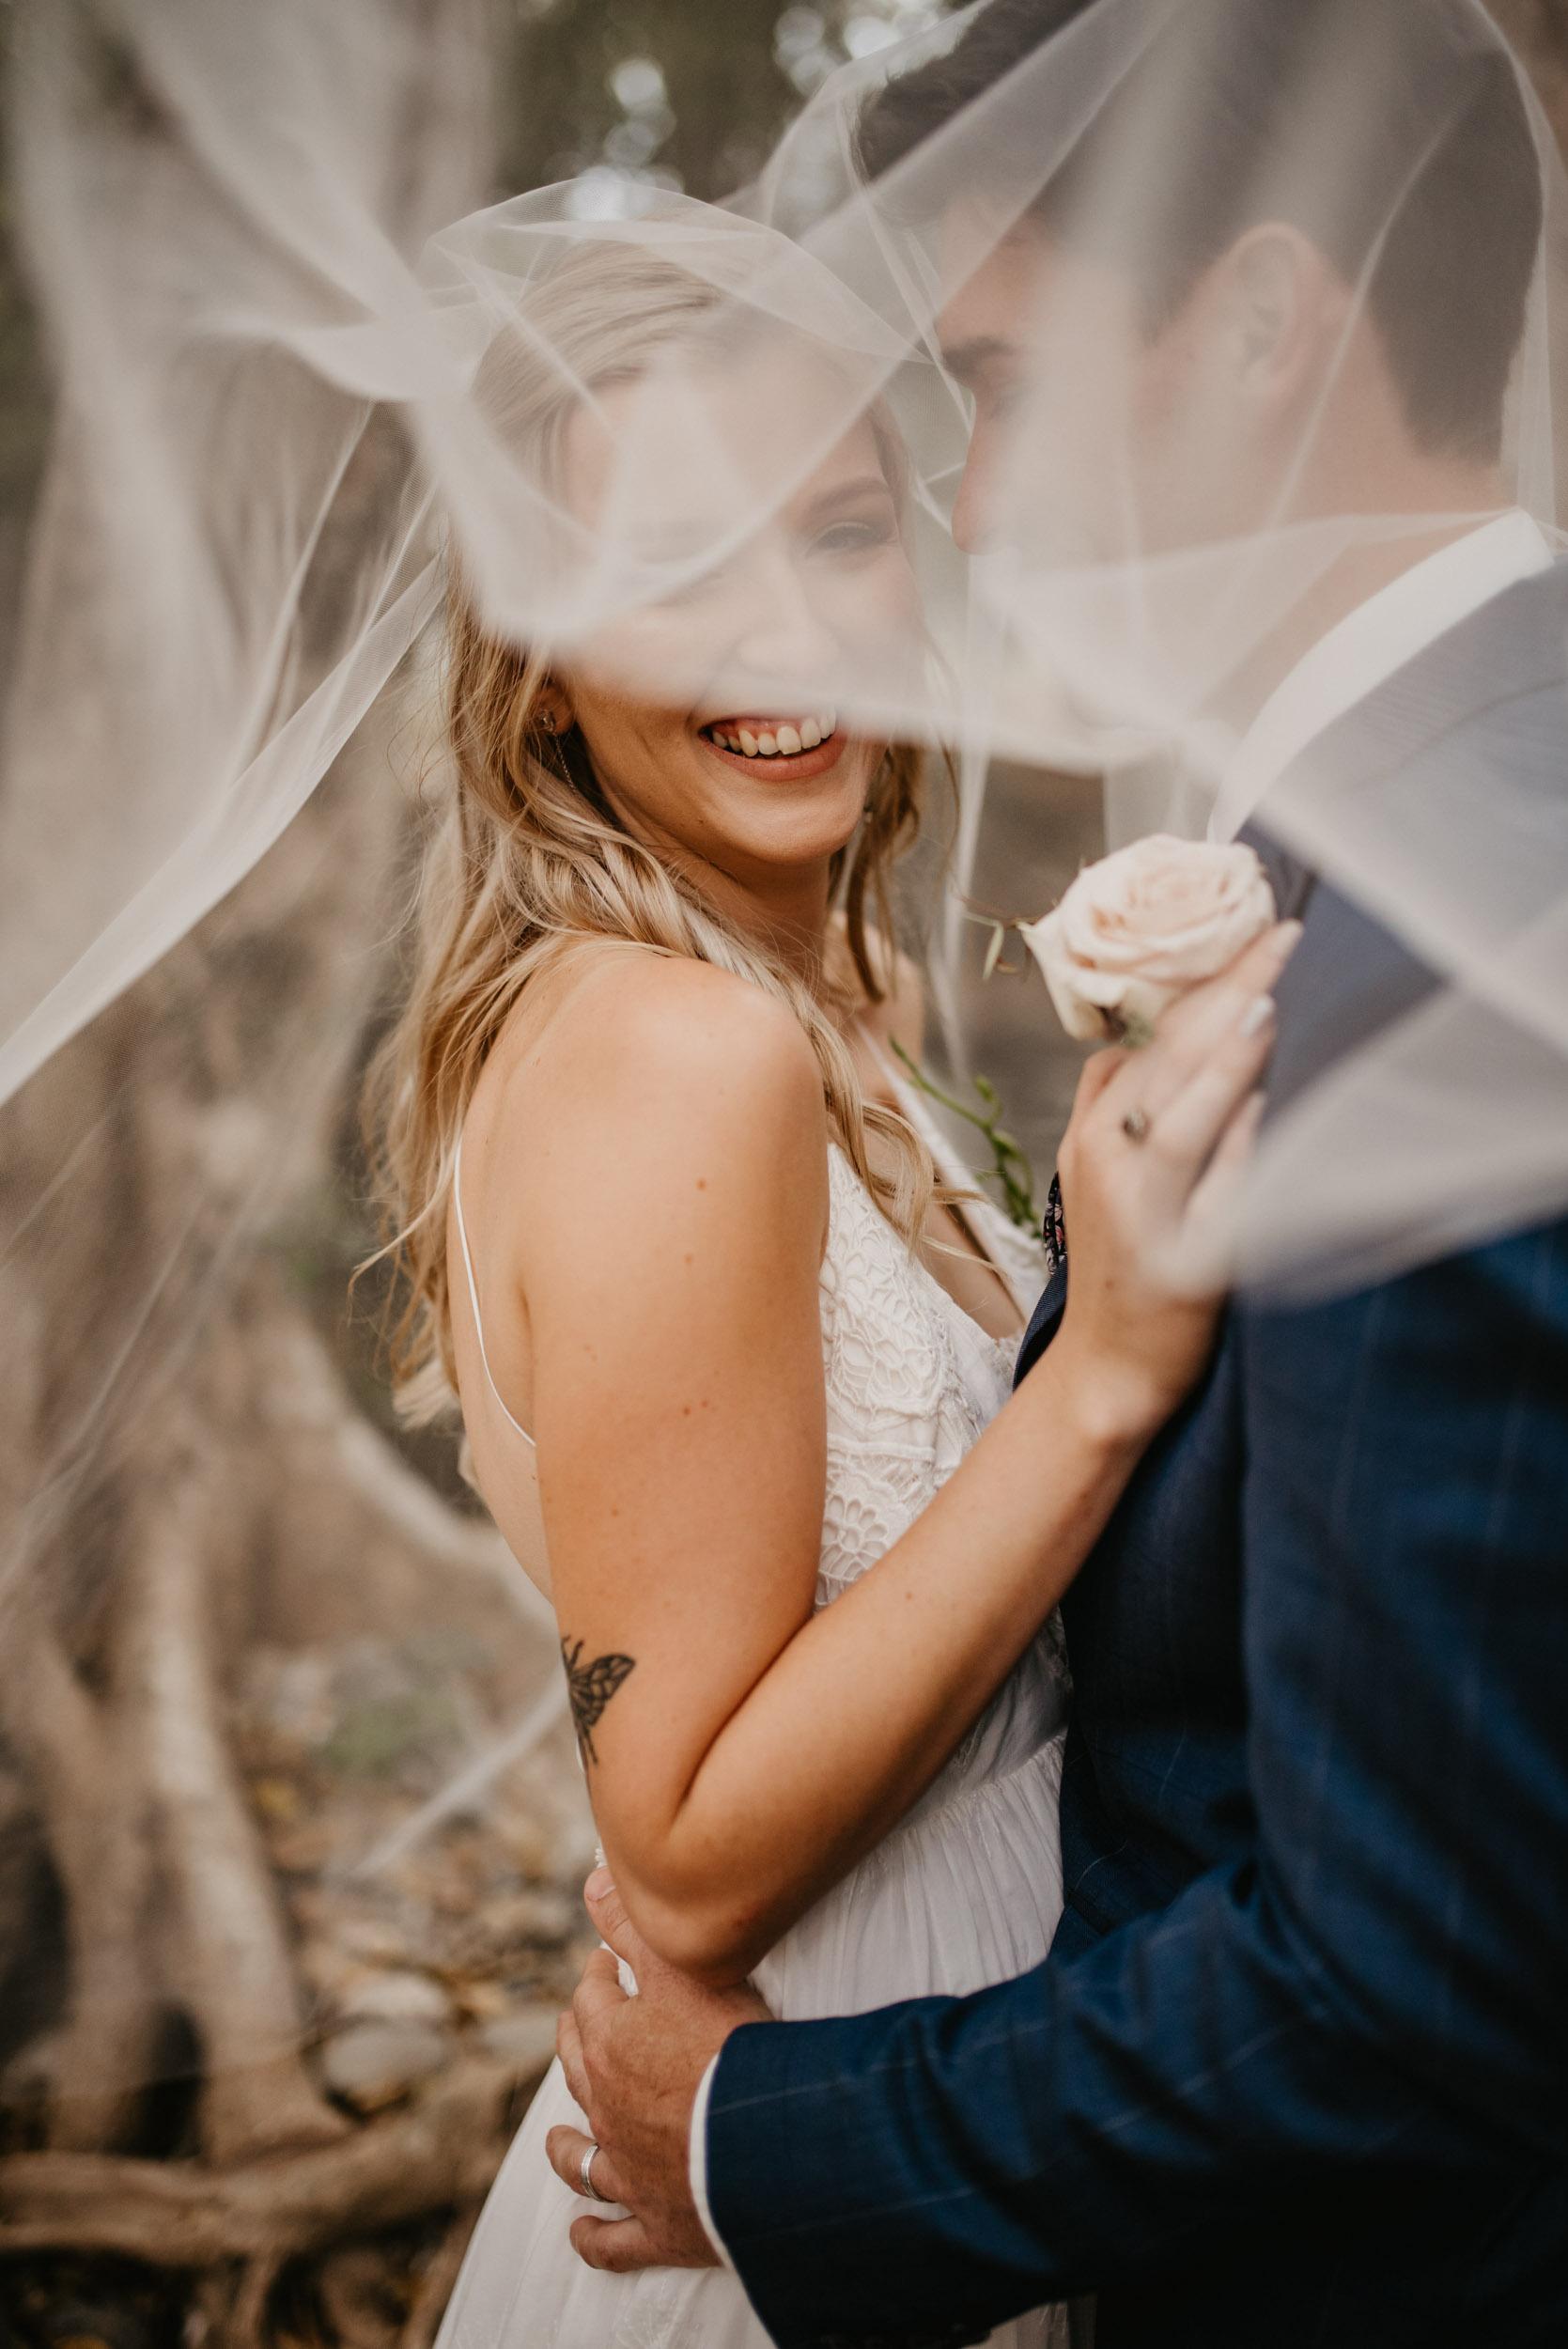 The Raw Photographer - Cairns Wedding Photographer - Laloli - Cairns Garden Wedding - Wedding Dress-58.jpg